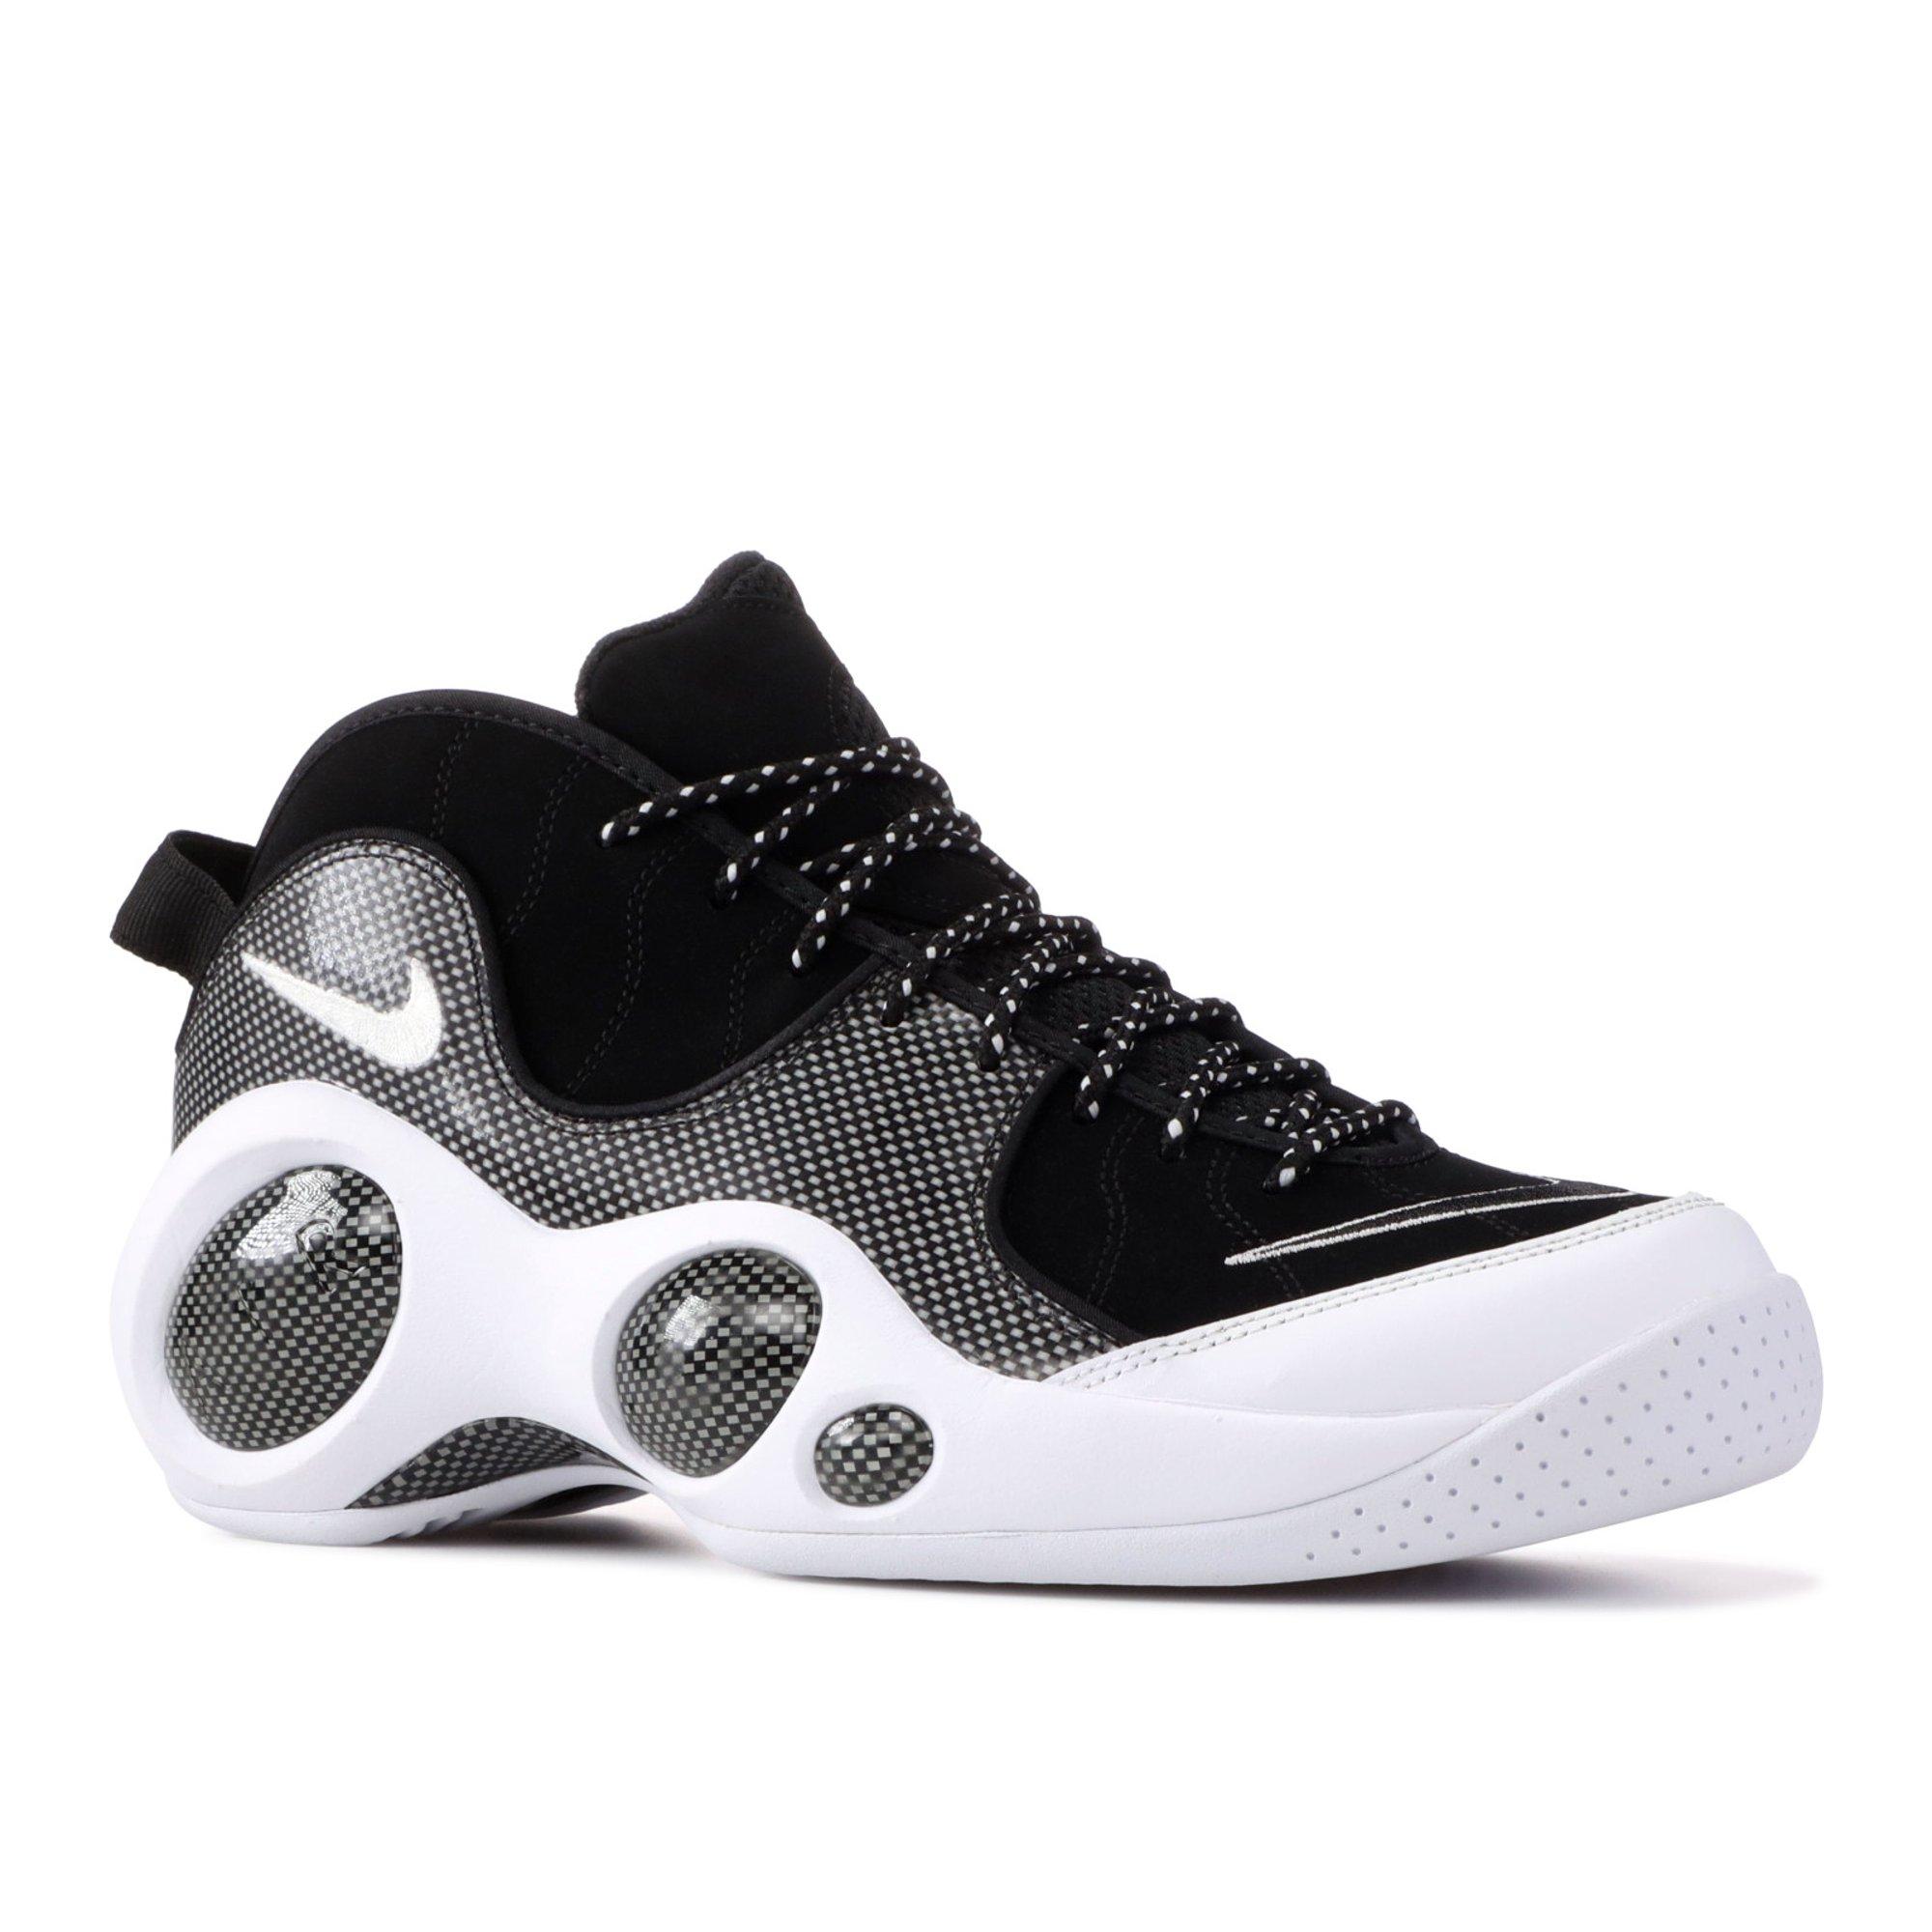 78f312b5ad19 Nike - Men - Air Zoom Flight 95 Se Og - 806404-001 - Size 9 ...